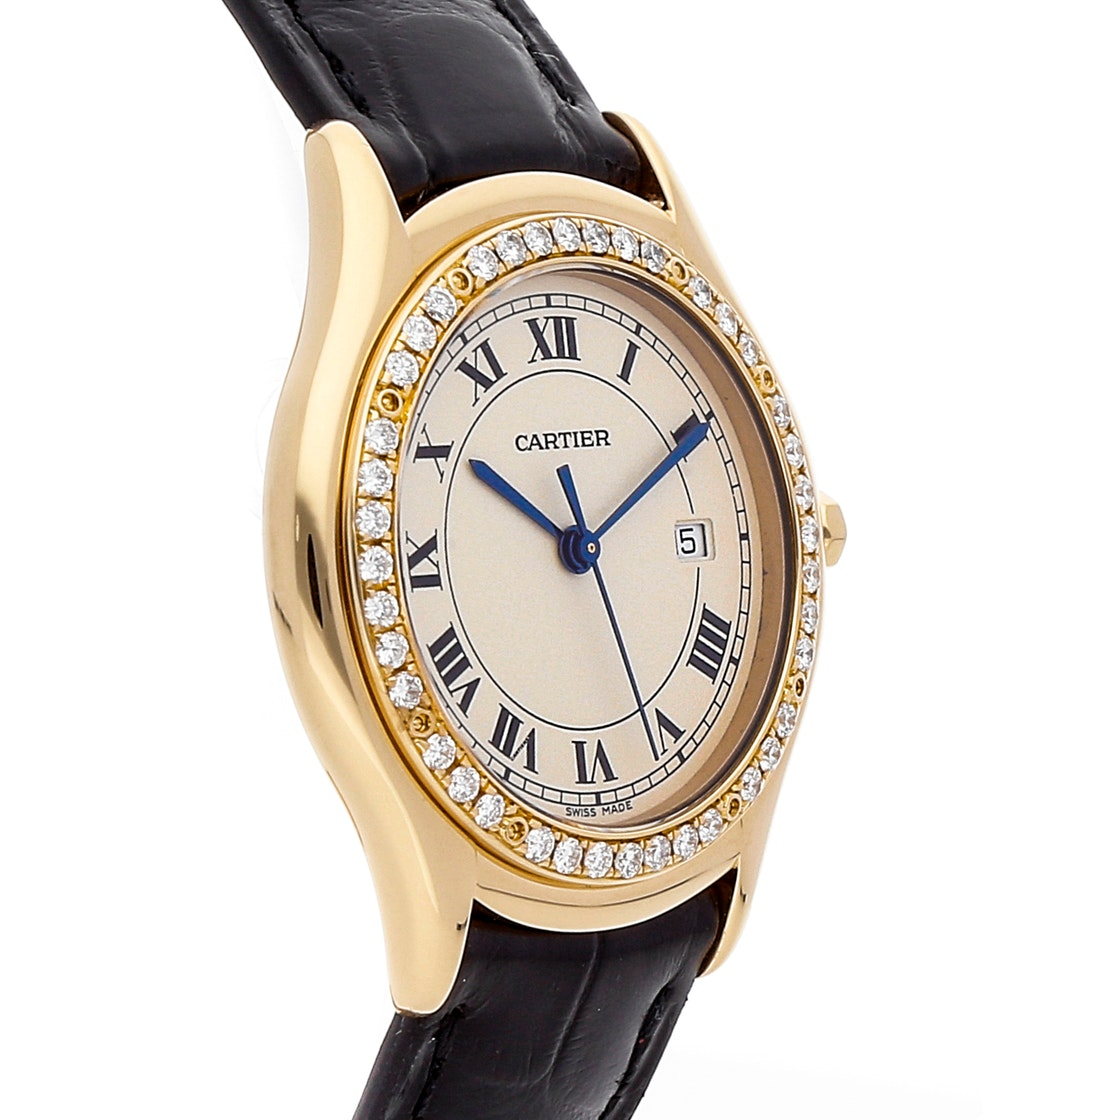 Cartier Cougar WF800451